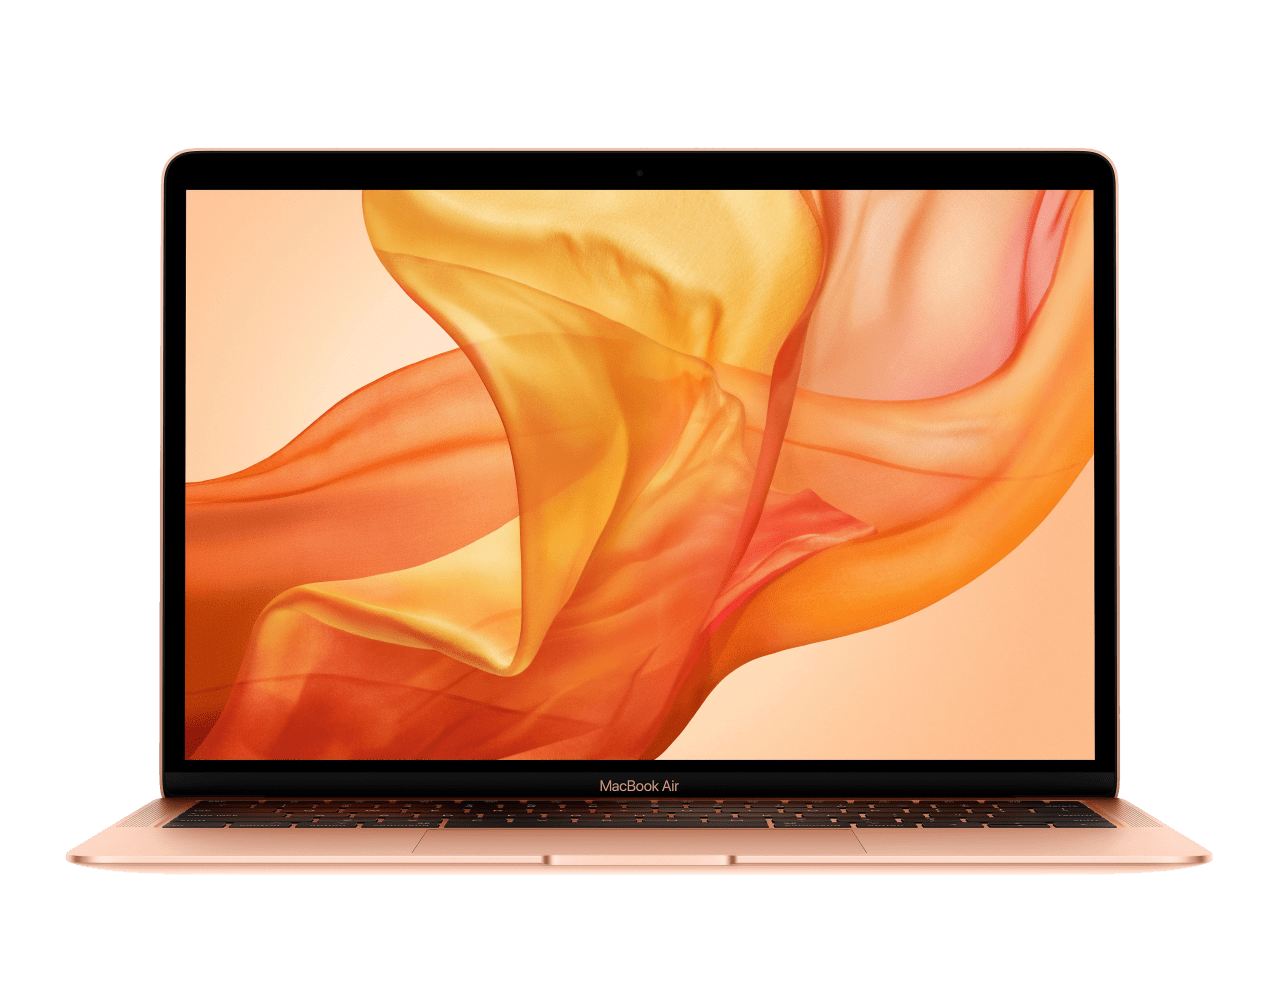 Gold Apple MacBook Air (Early 2020) Notebook - Intel® Core™ i5-1030NG7 - 8GB - 512GB SSD - Intel® Iris Plus Graphics.1